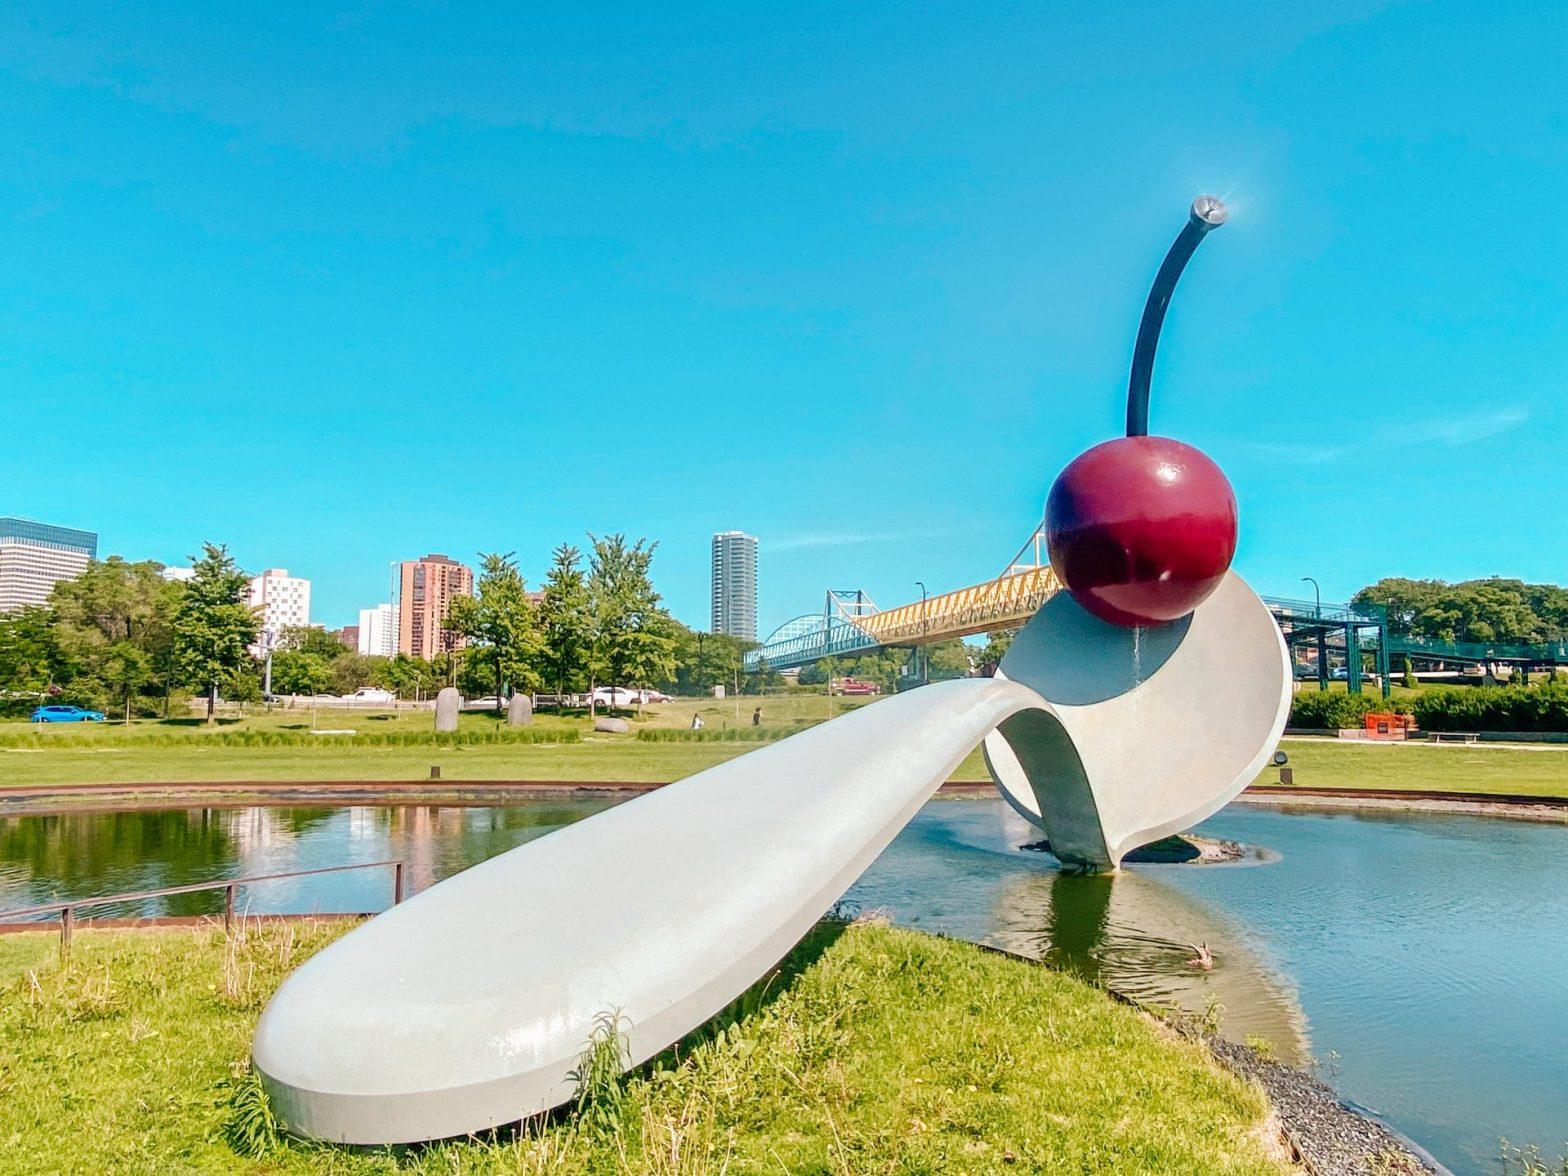 Spoon and cherry sculpture located at Walker art center sculpture garden in Minneapolis, Minnesota